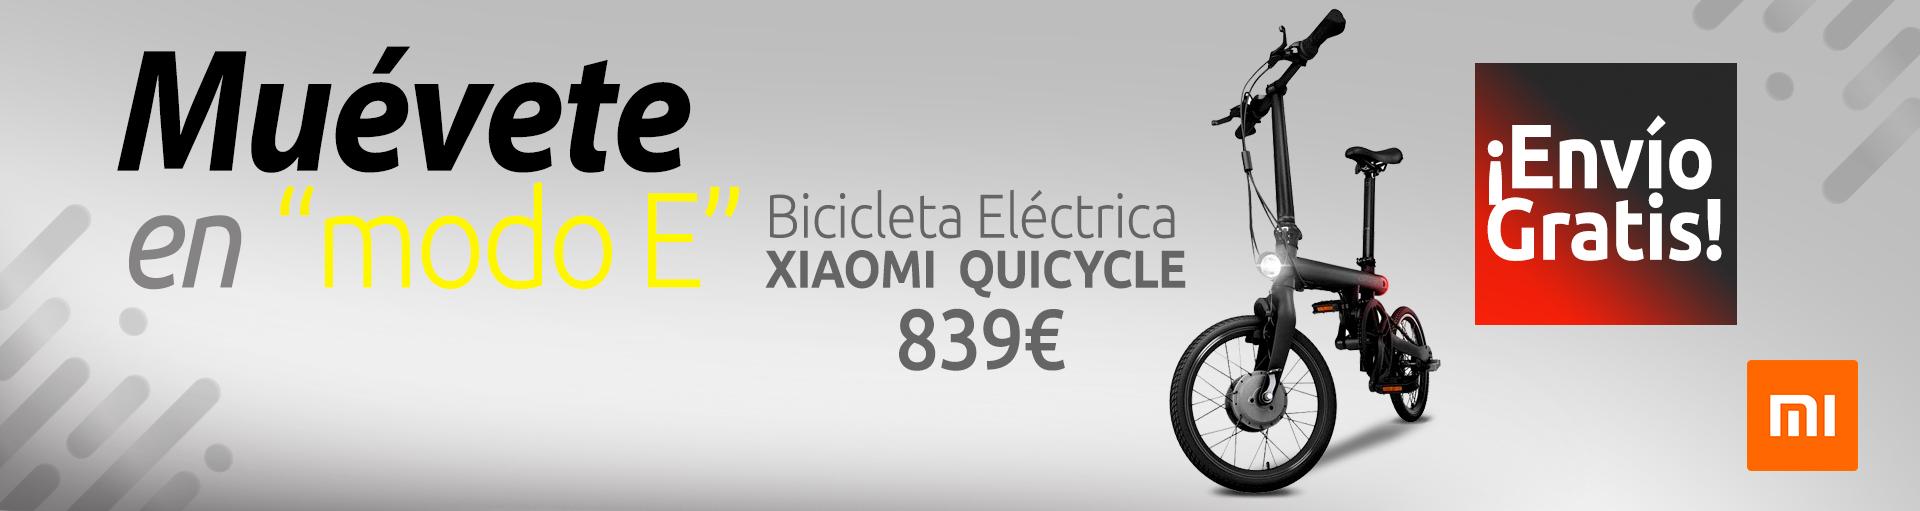 Bici Xiaomi portes gratis